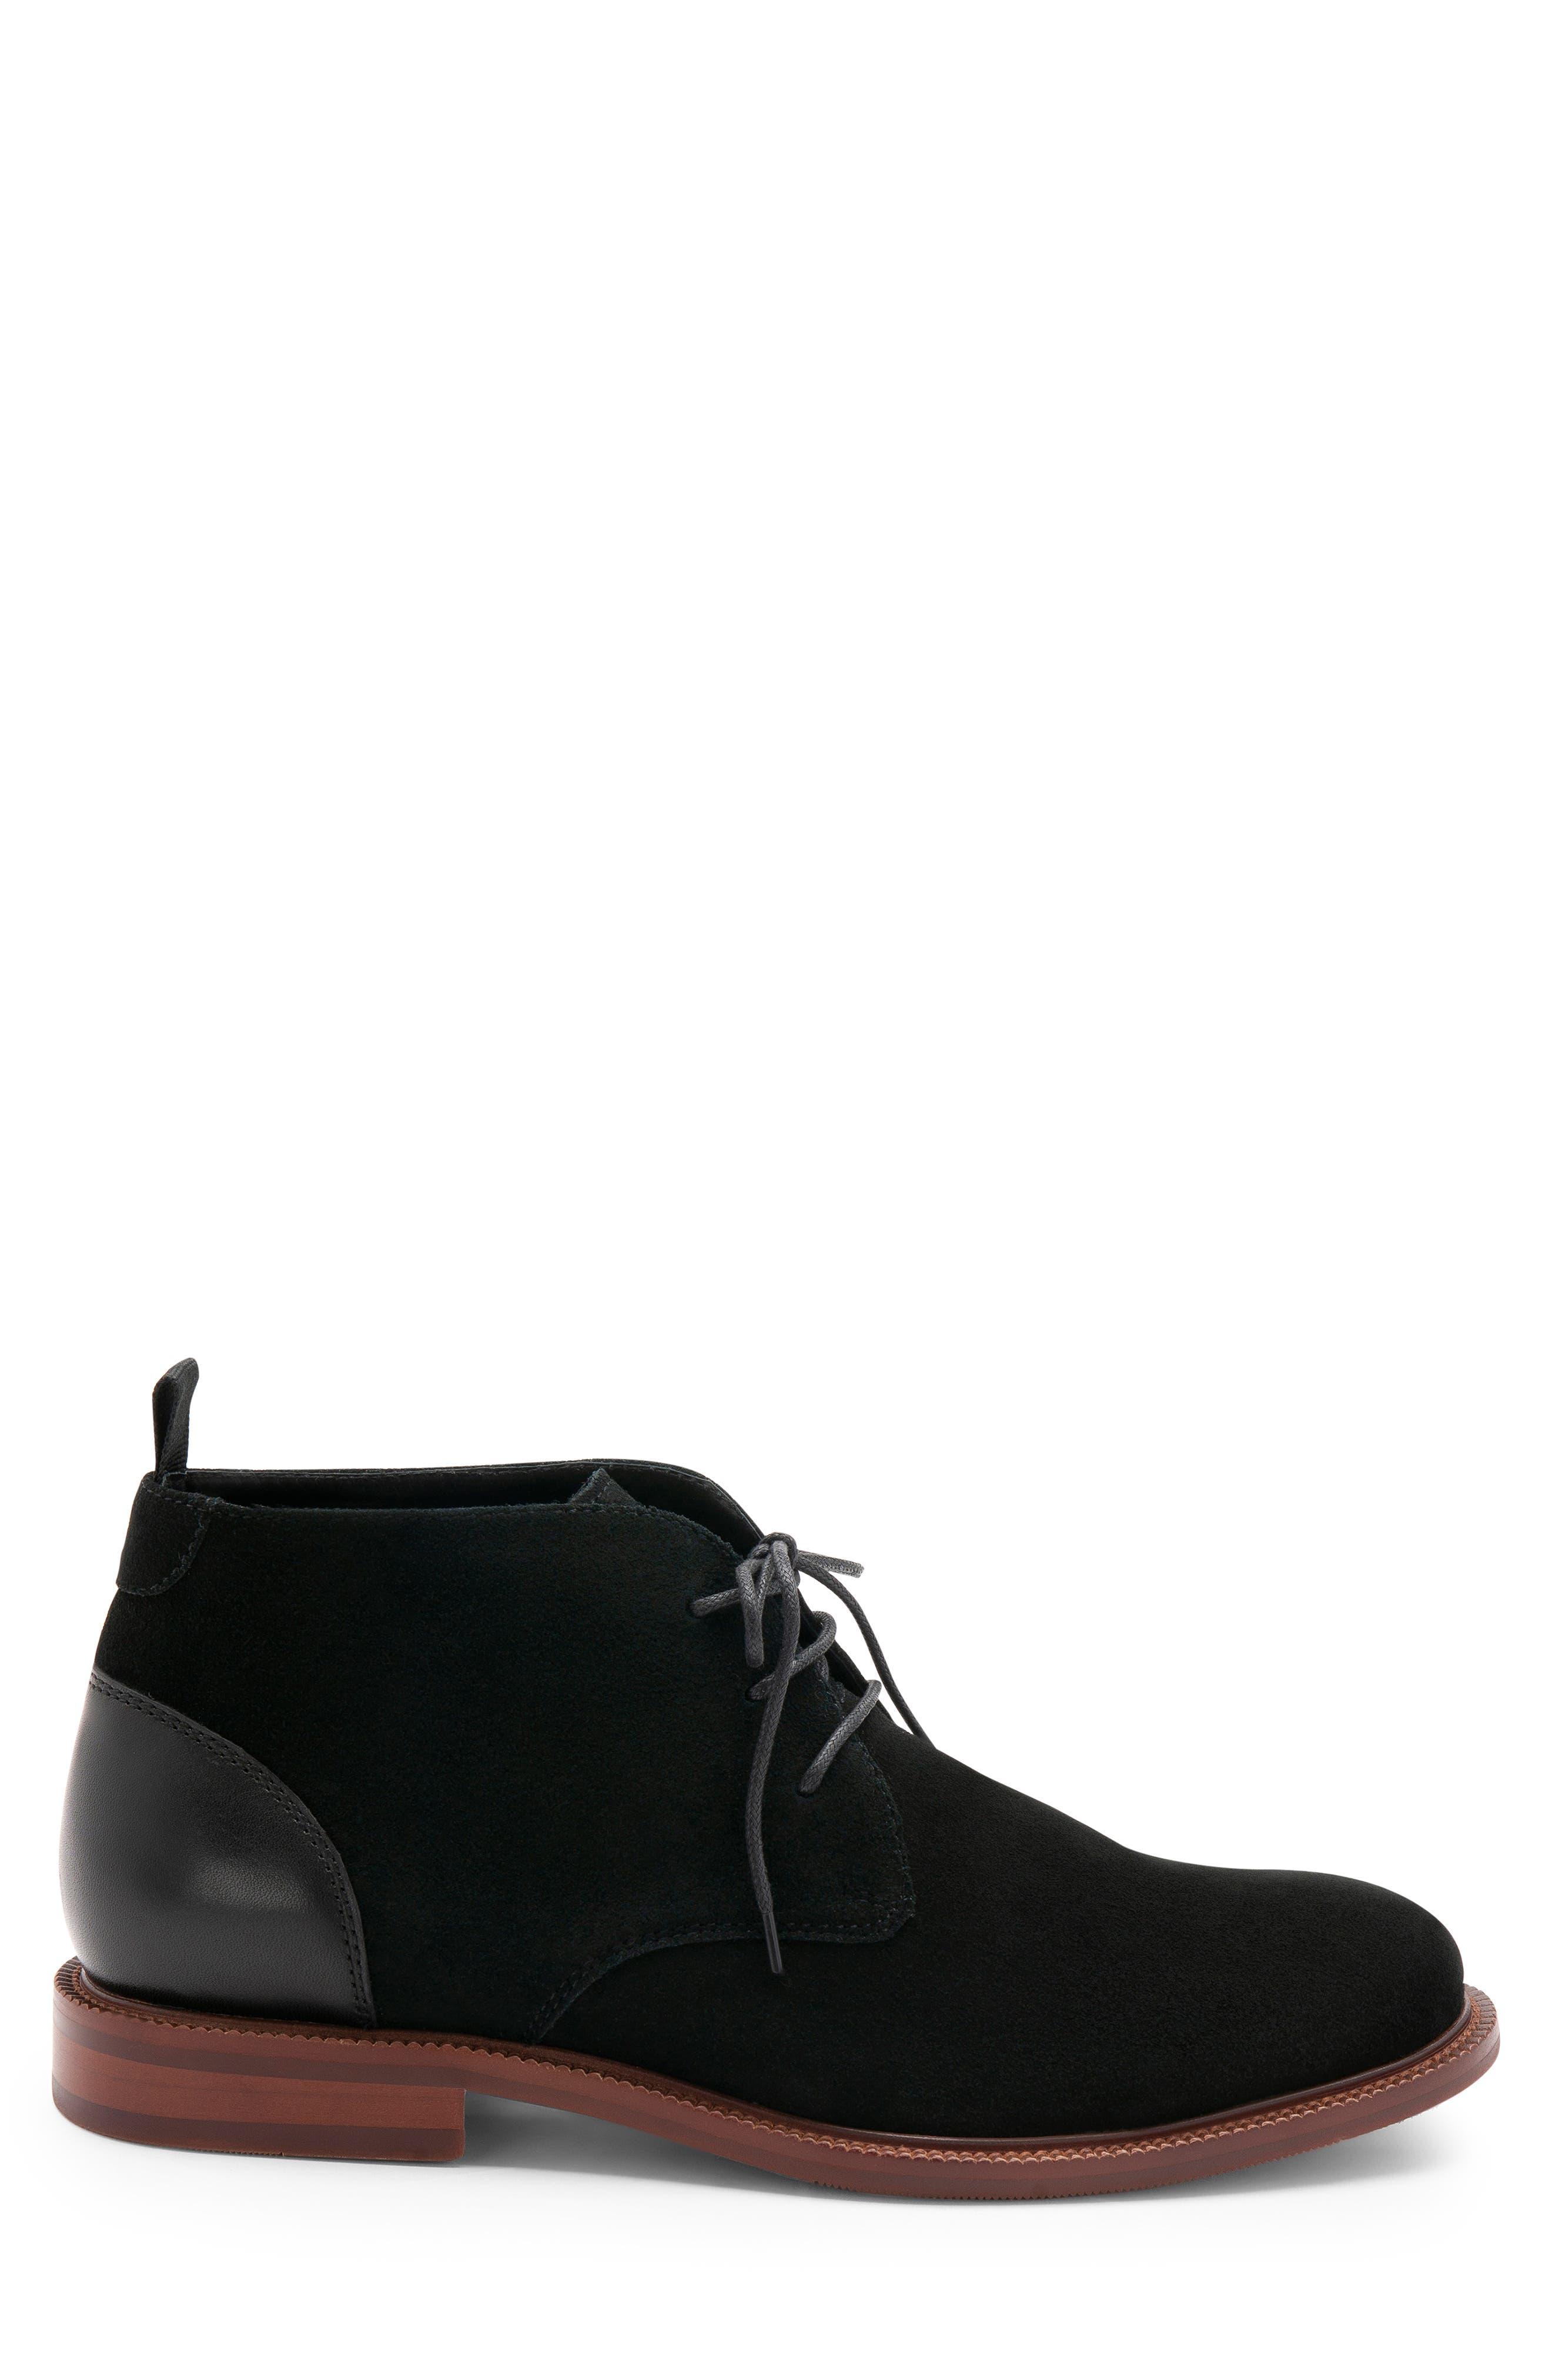 Keith Waterproof Chukka Boot,                             Alternate thumbnail 3, color,                             BLACK SUEDE